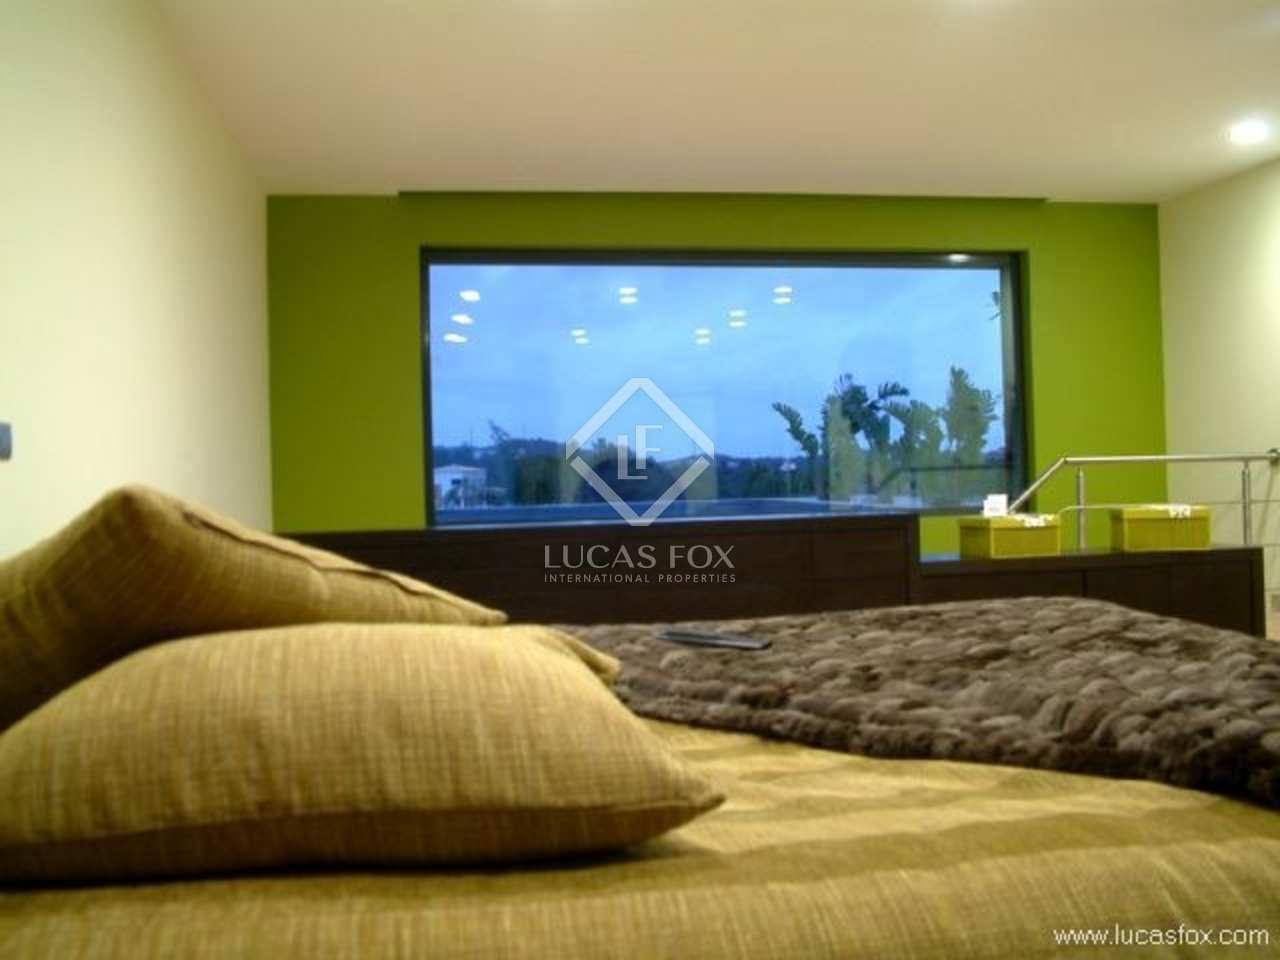 389m haus villa zum verkauf in algarve portugal. Black Bedroom Furniture Sets. Home Design Ideas